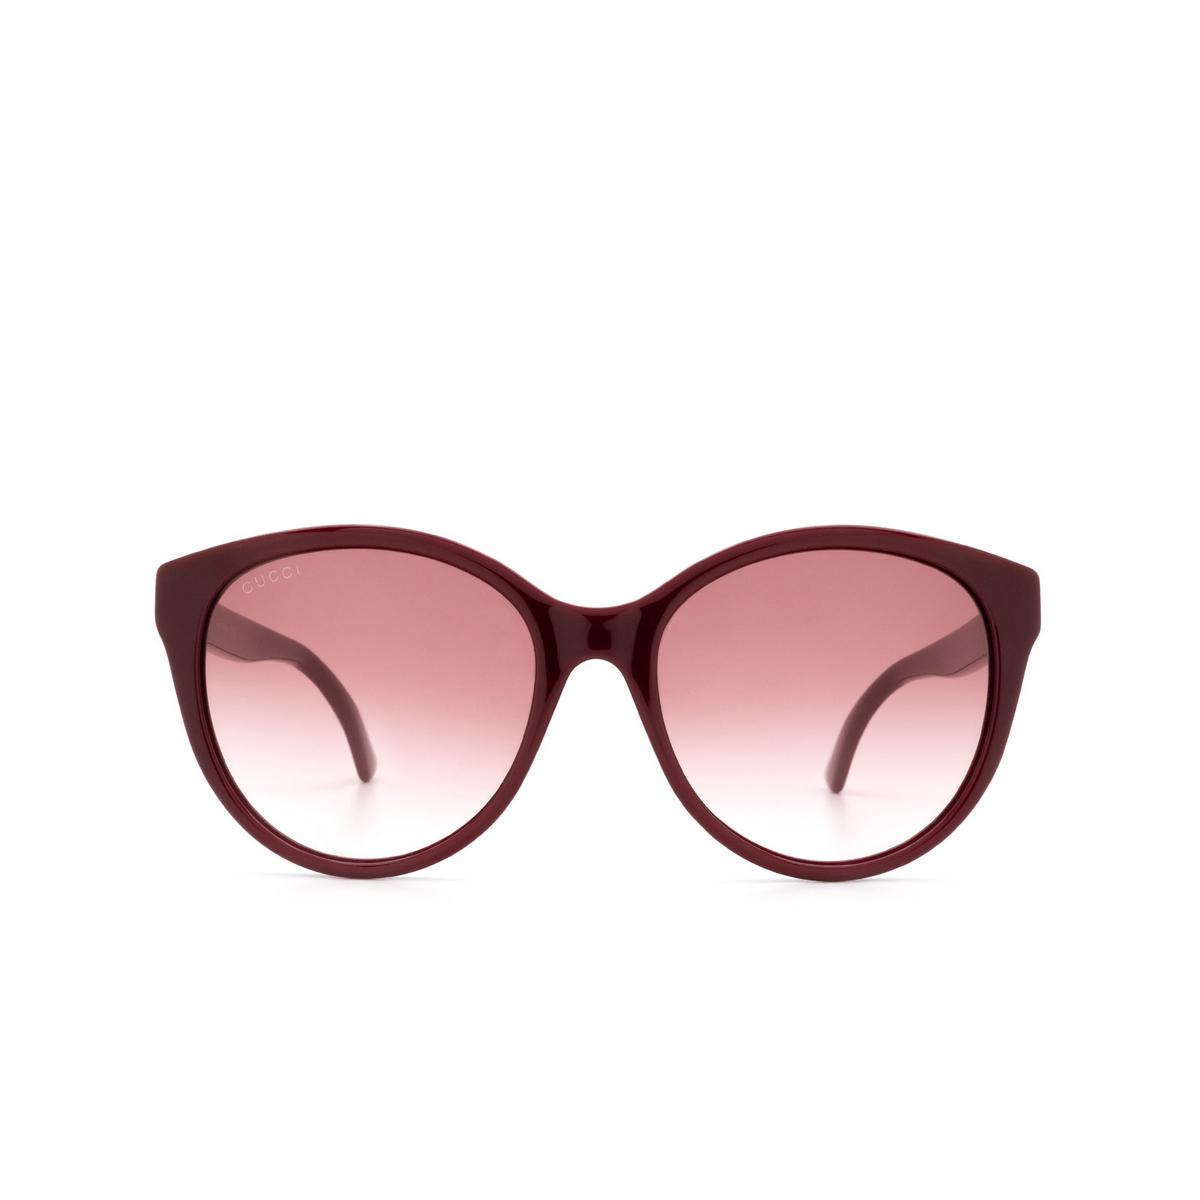 Gucci® Round Sunglasses: GG0631S color Burgundy 003 - 1/3.